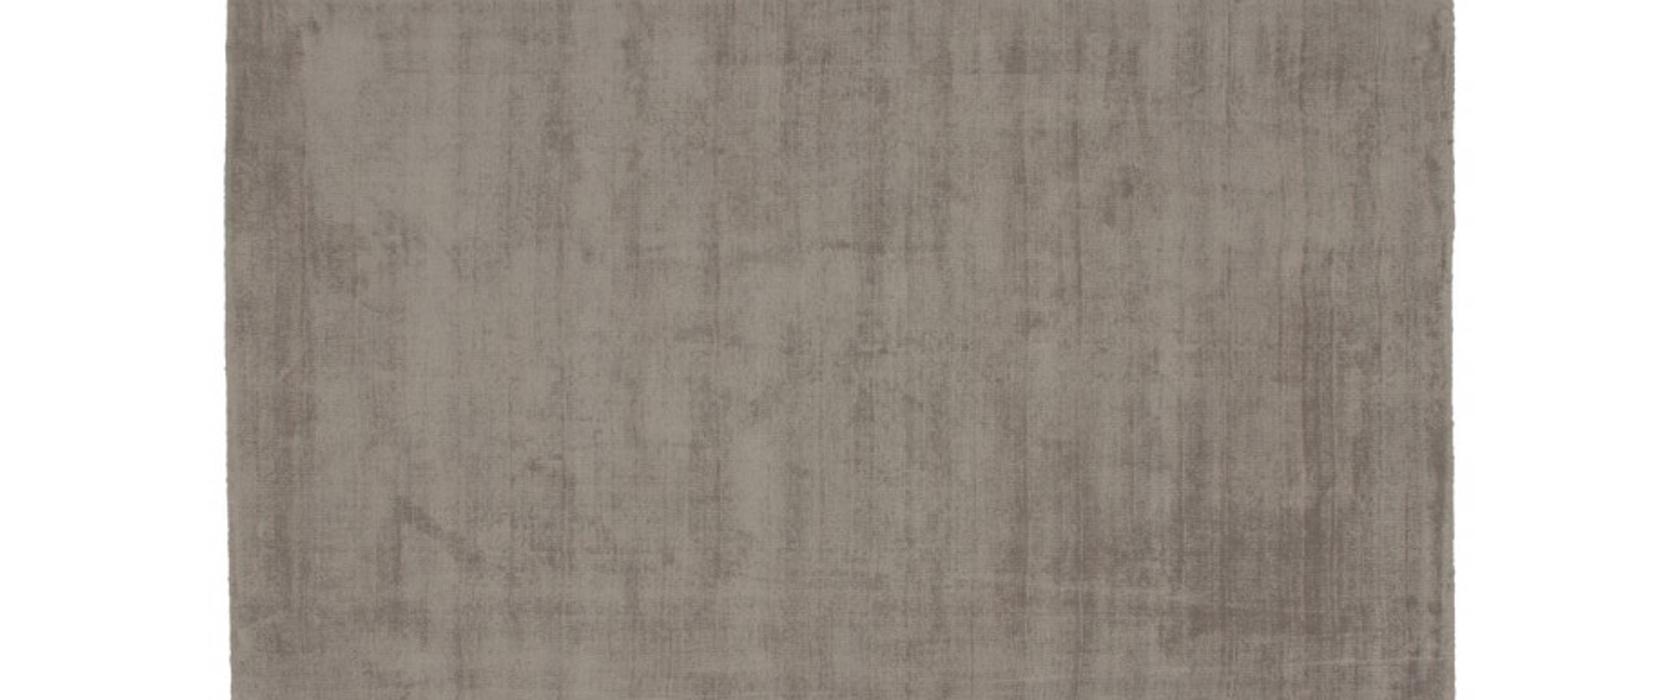 Килим My Maori 220 Taupe 160х230 см - Pufetto